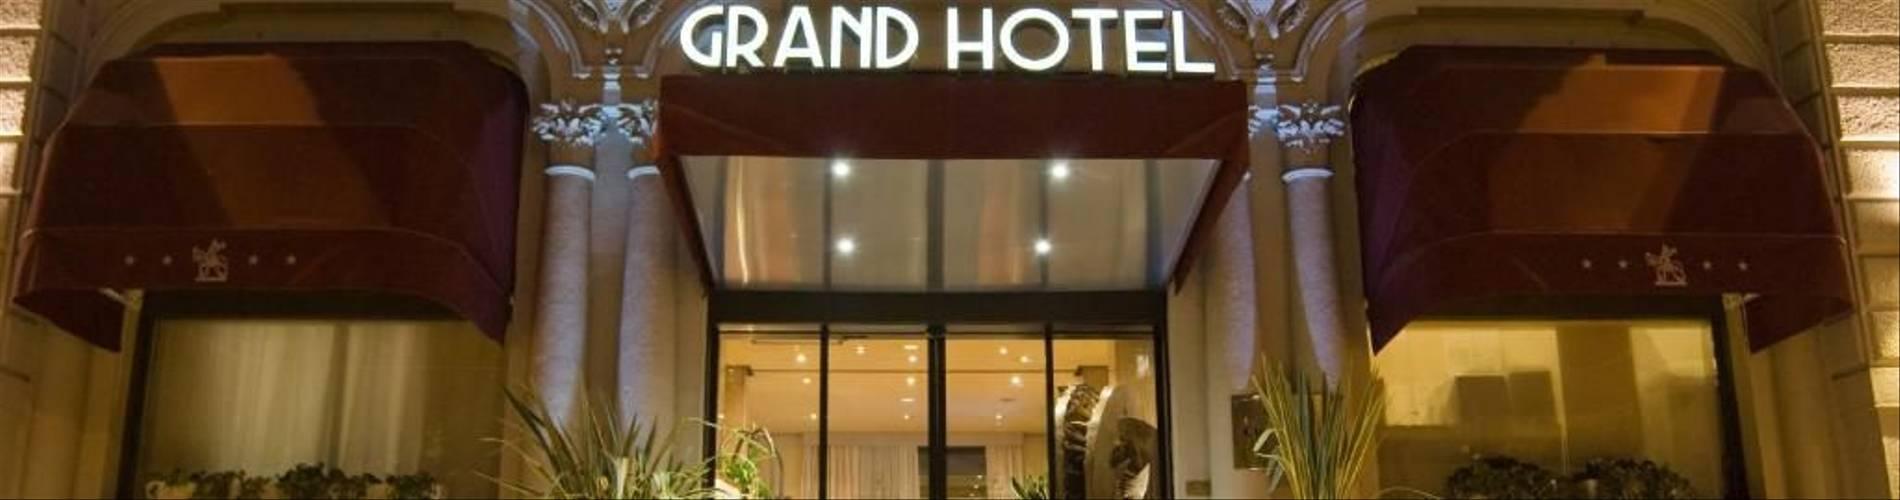 Grand Hotel Des Arts 5.jpg